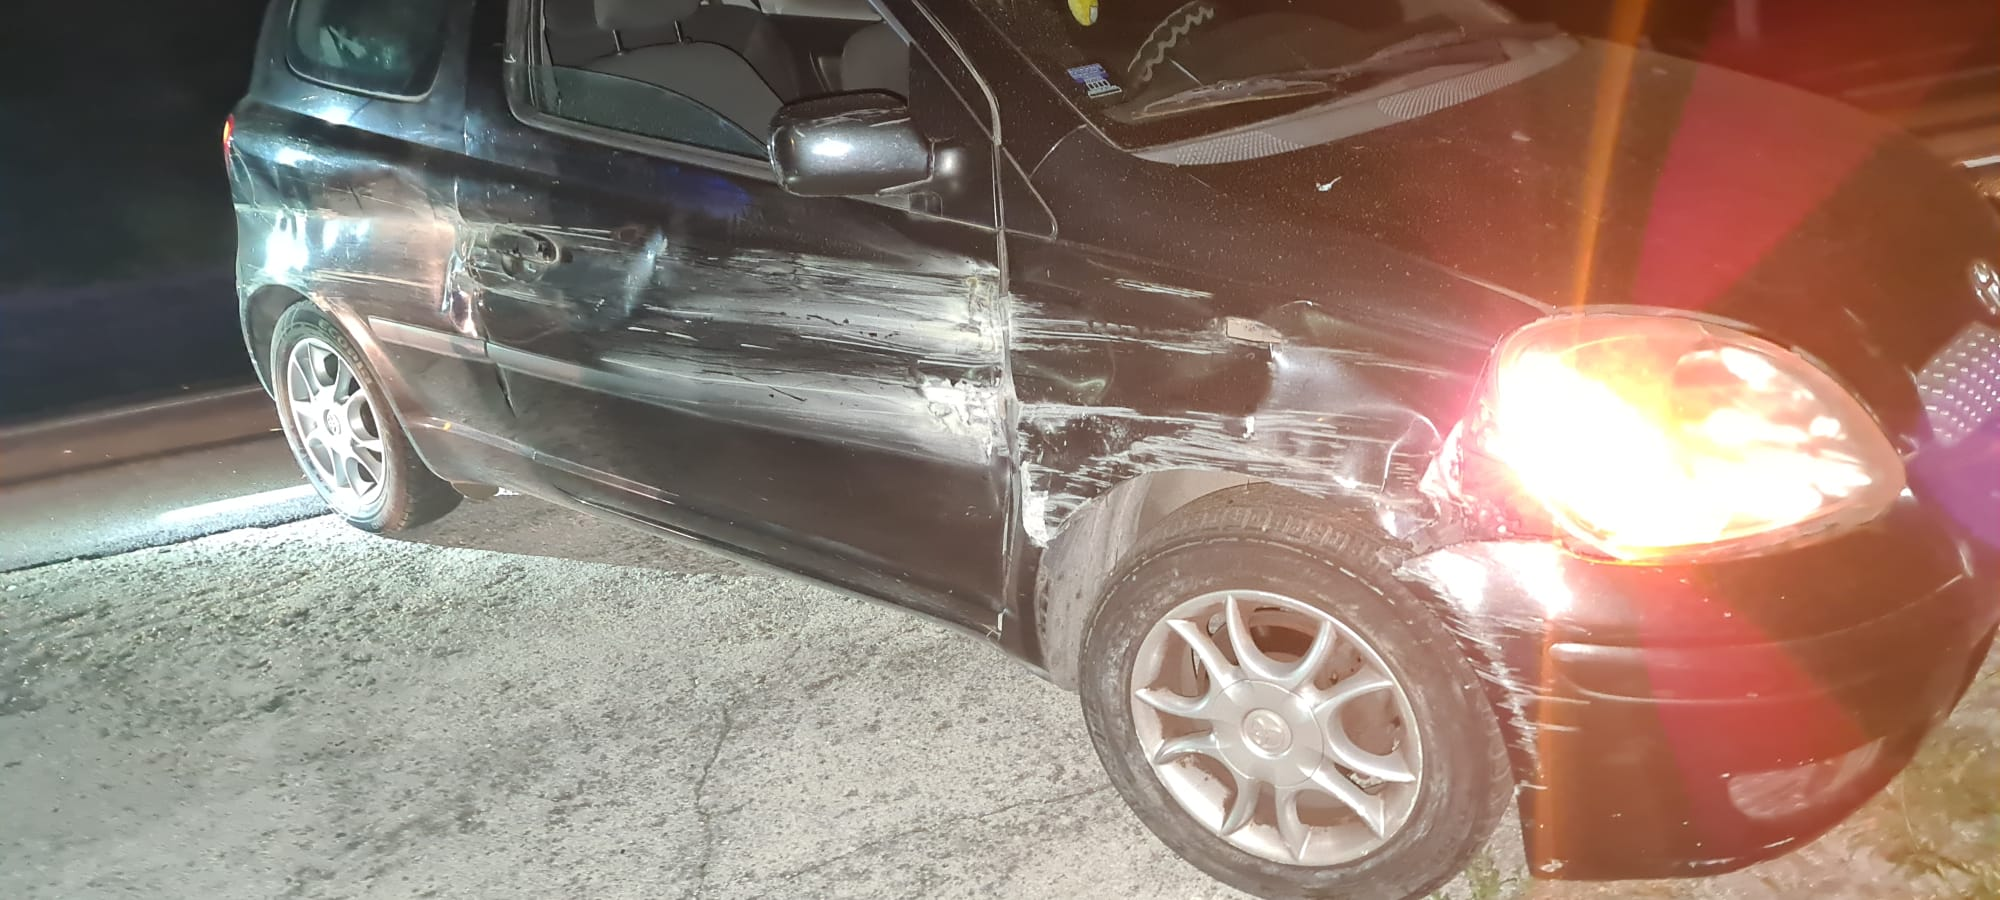 Velletri, 2 gravi incidenti nella notte tra martedì e mercoledì: 2 feriti